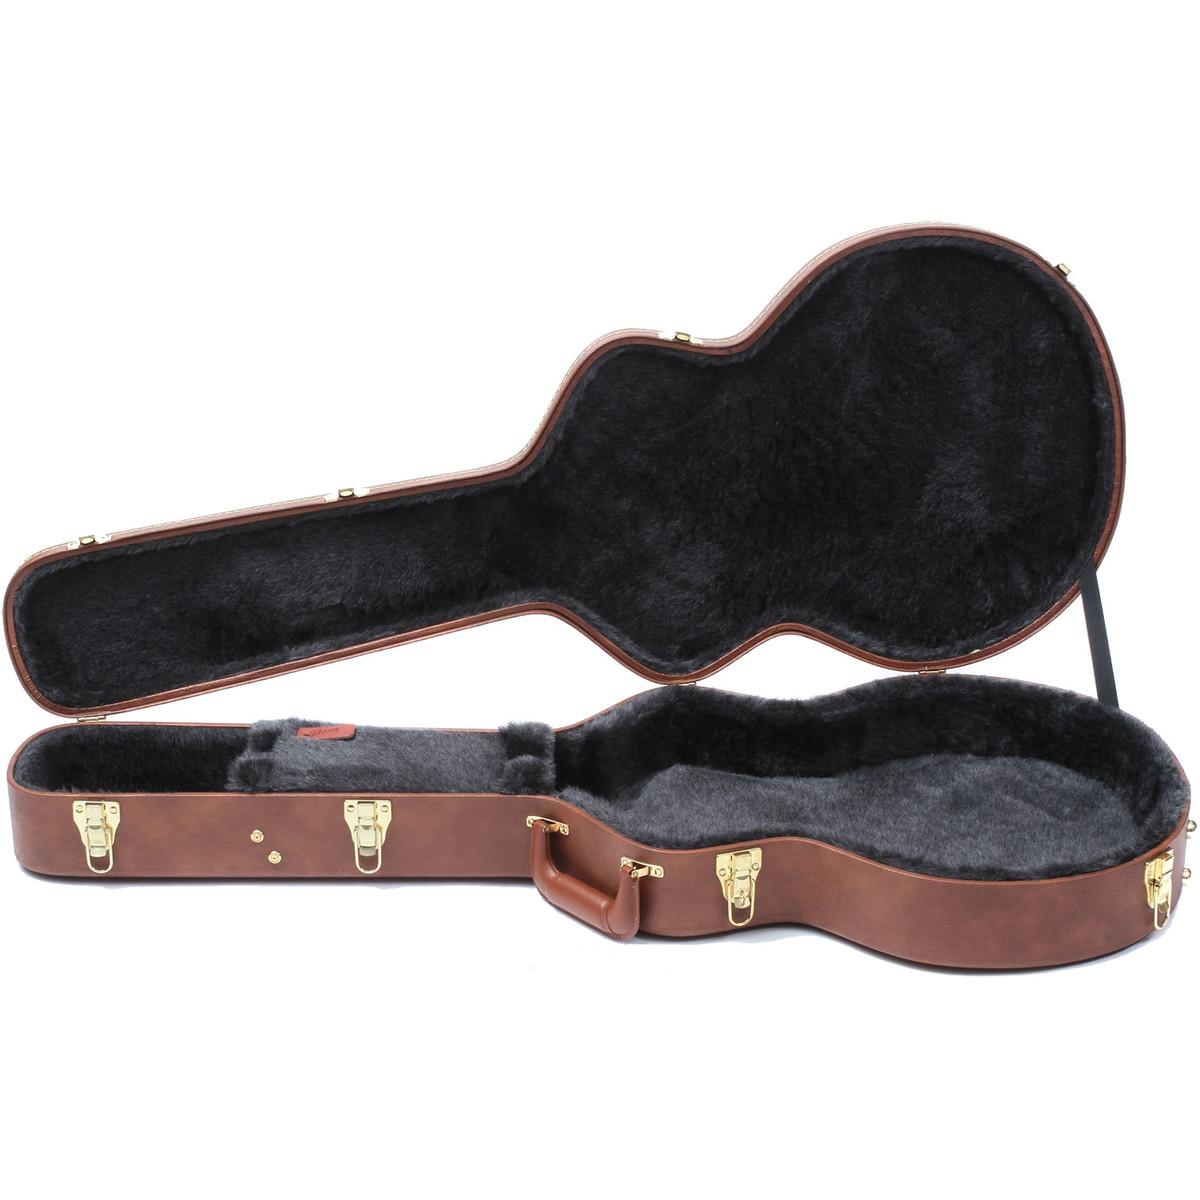 b0aeea05dfc Gibson ES Hard Case for Semi-Hollow Electric Guitar at Gear4music